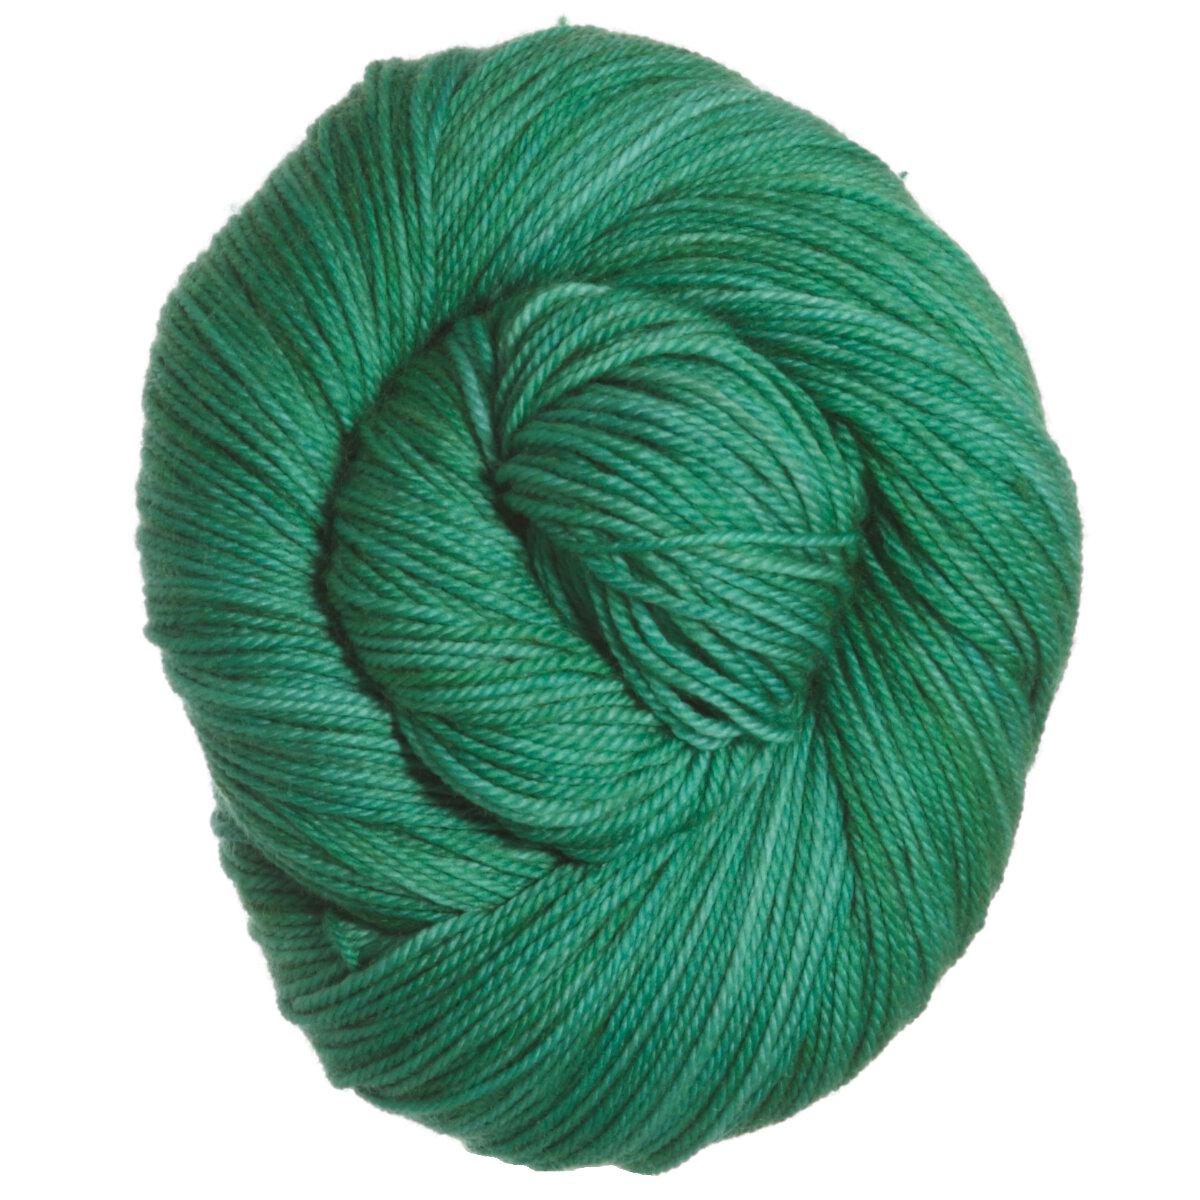 Squishy Yarn : Anzula Squishy Yarn - Peacock at Jimmy Beans Wool